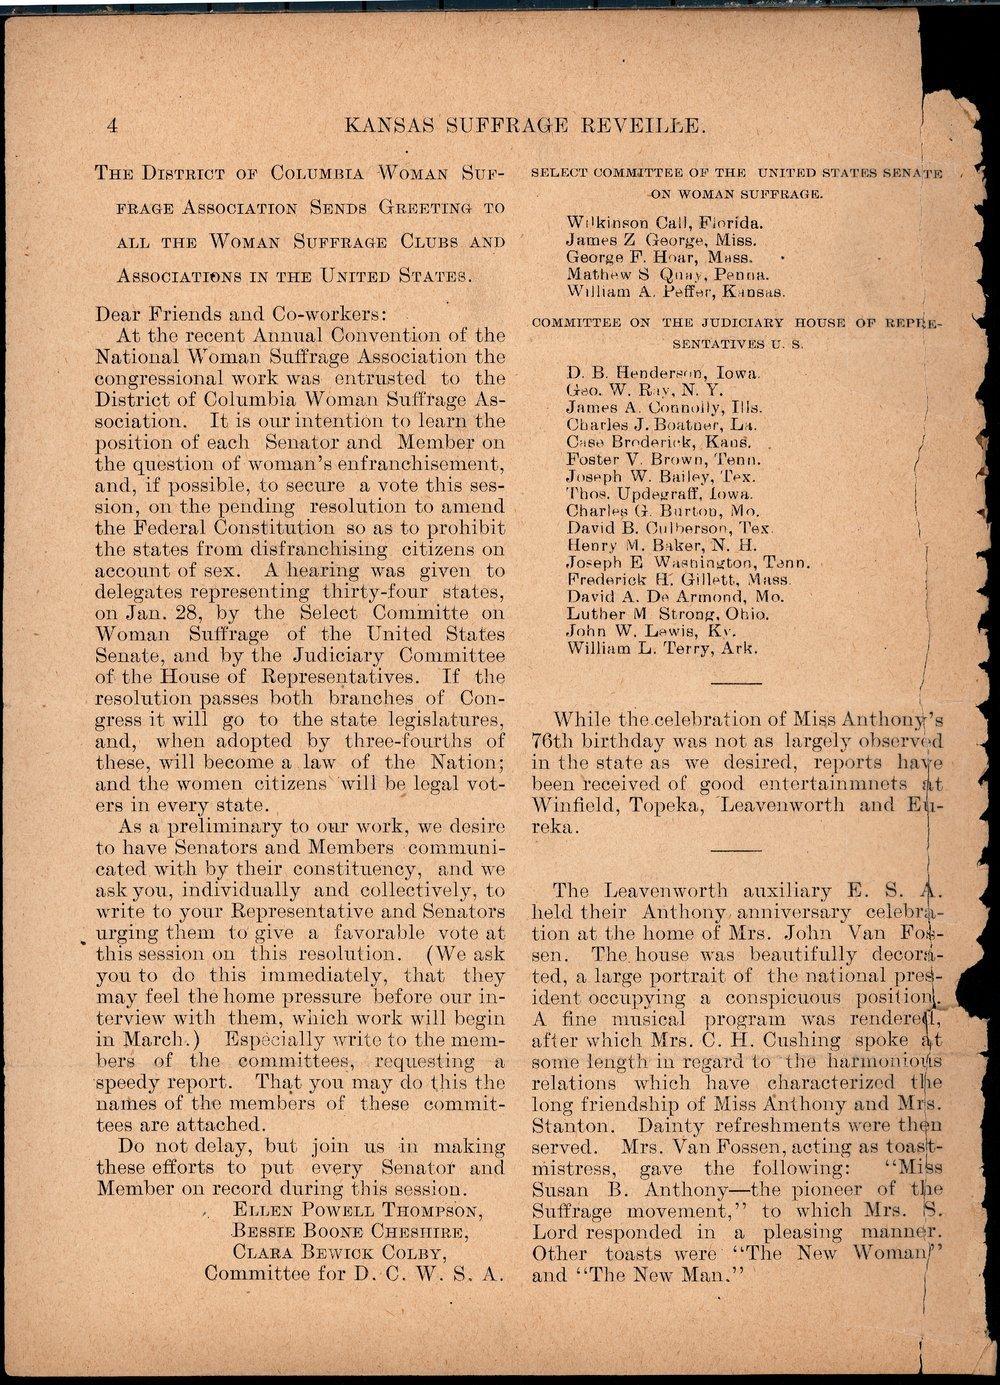 Kansas Suffrage Reveille: organ of the Kansas Equal Suffrage Association - 4